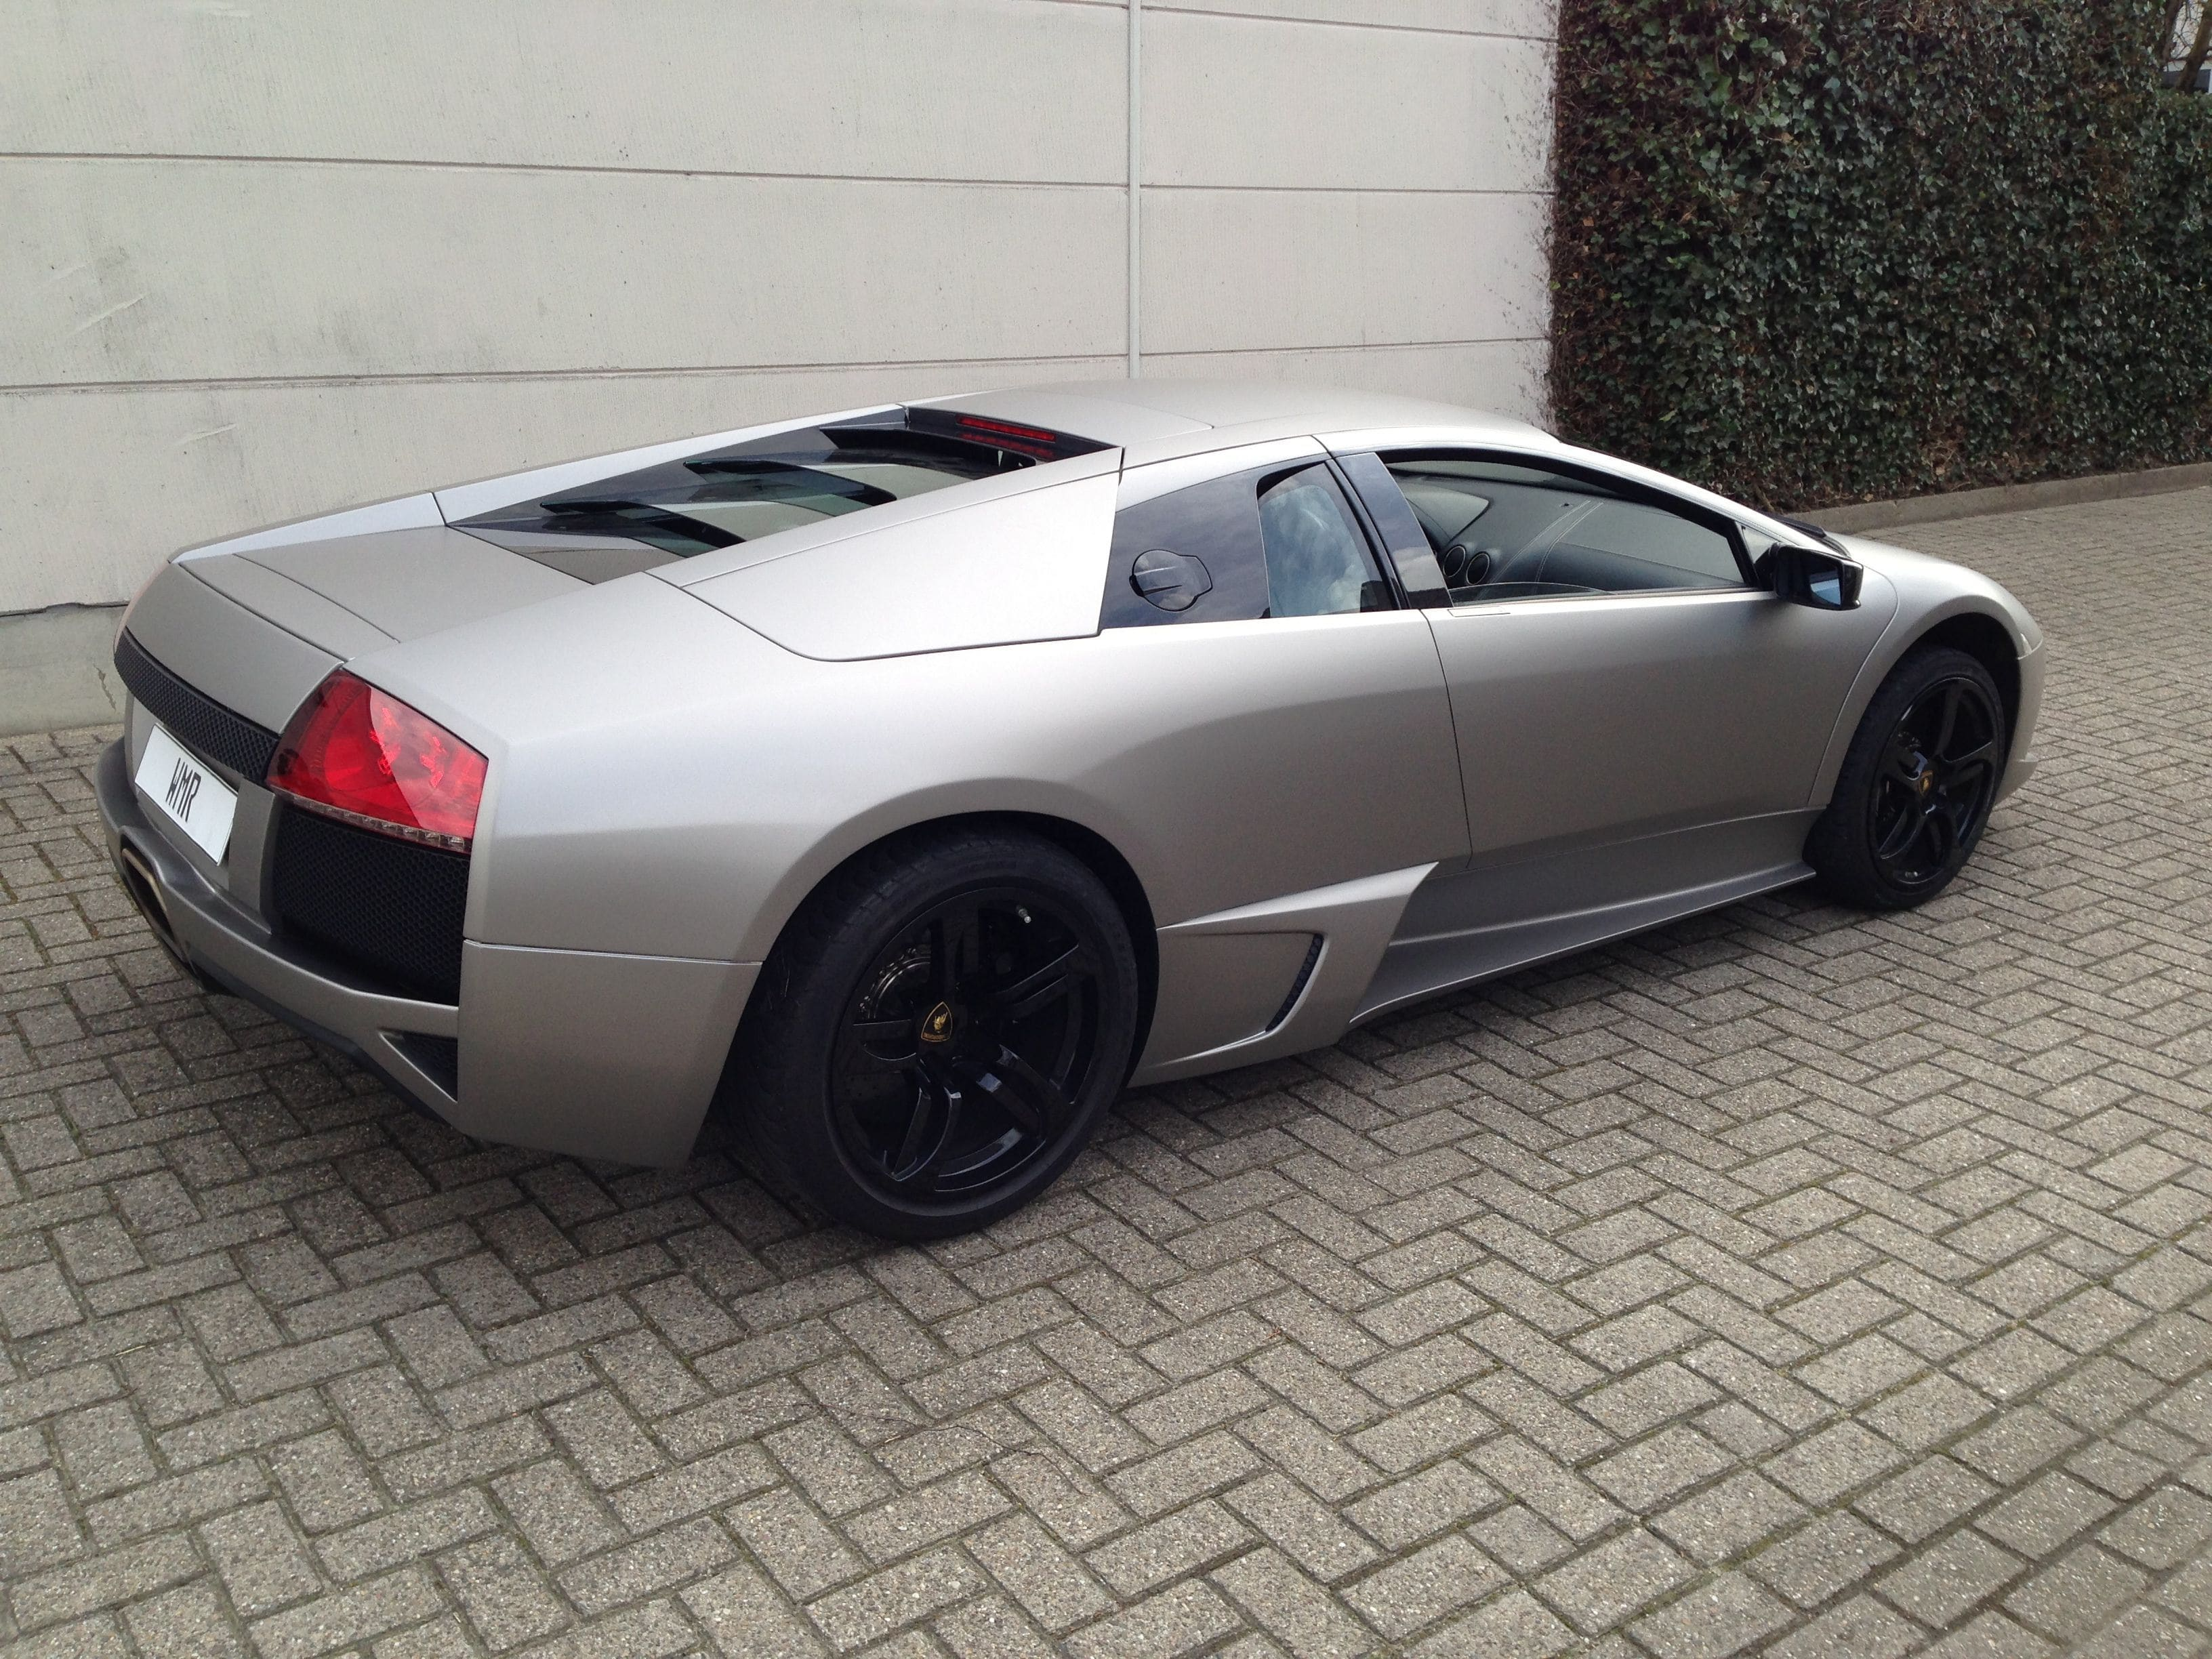 Lamborghini Murcialago LP670 met Gunpowder Wrap, Carwrapping door Wrapmyride.nu Foto-nr:5984, ©2021